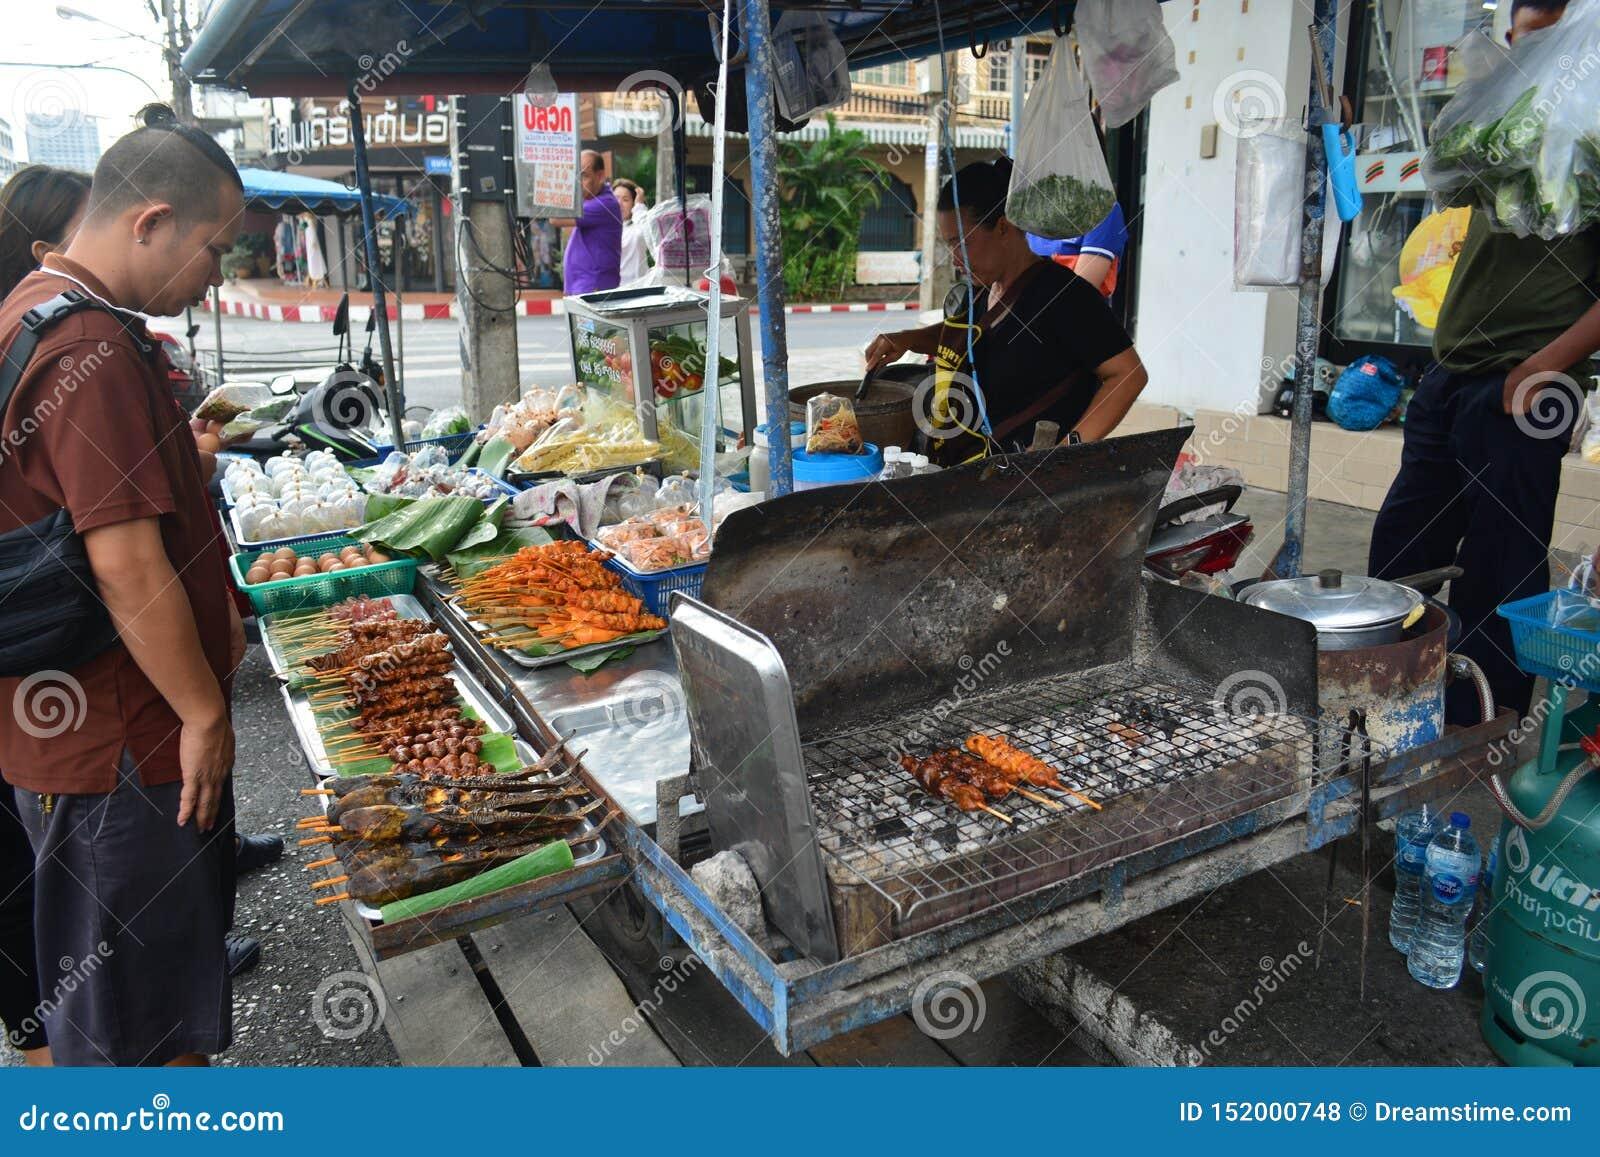 Som-Tam Stall in street food stall the roadside